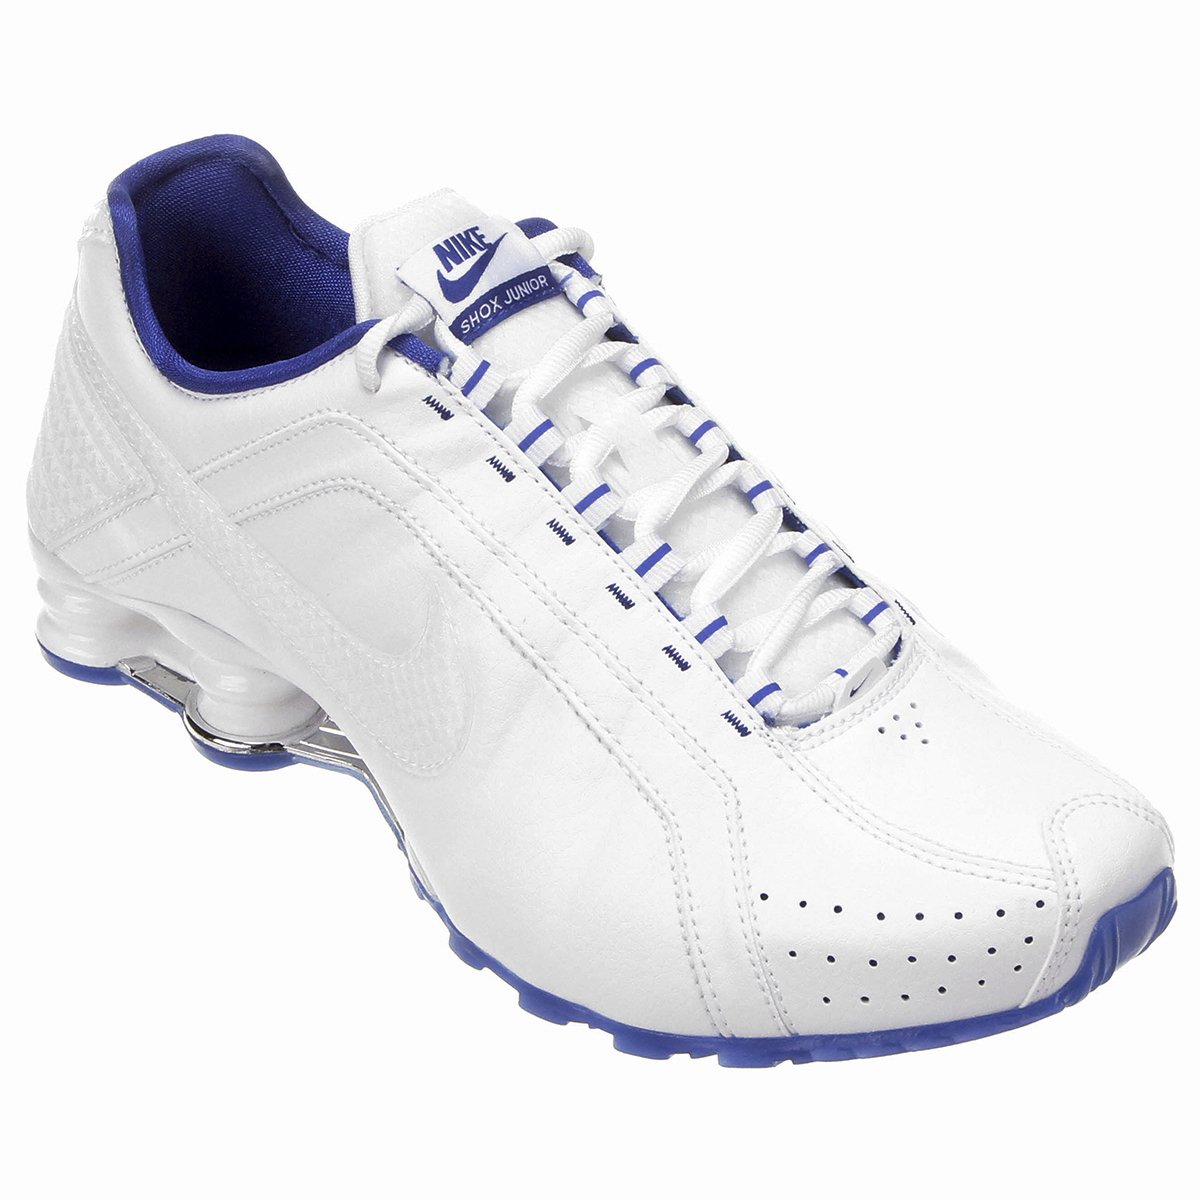 c11a568952750 ... inexpensive tênis nike shox junior compre agora netshoes 7dc30 a9b4d ...